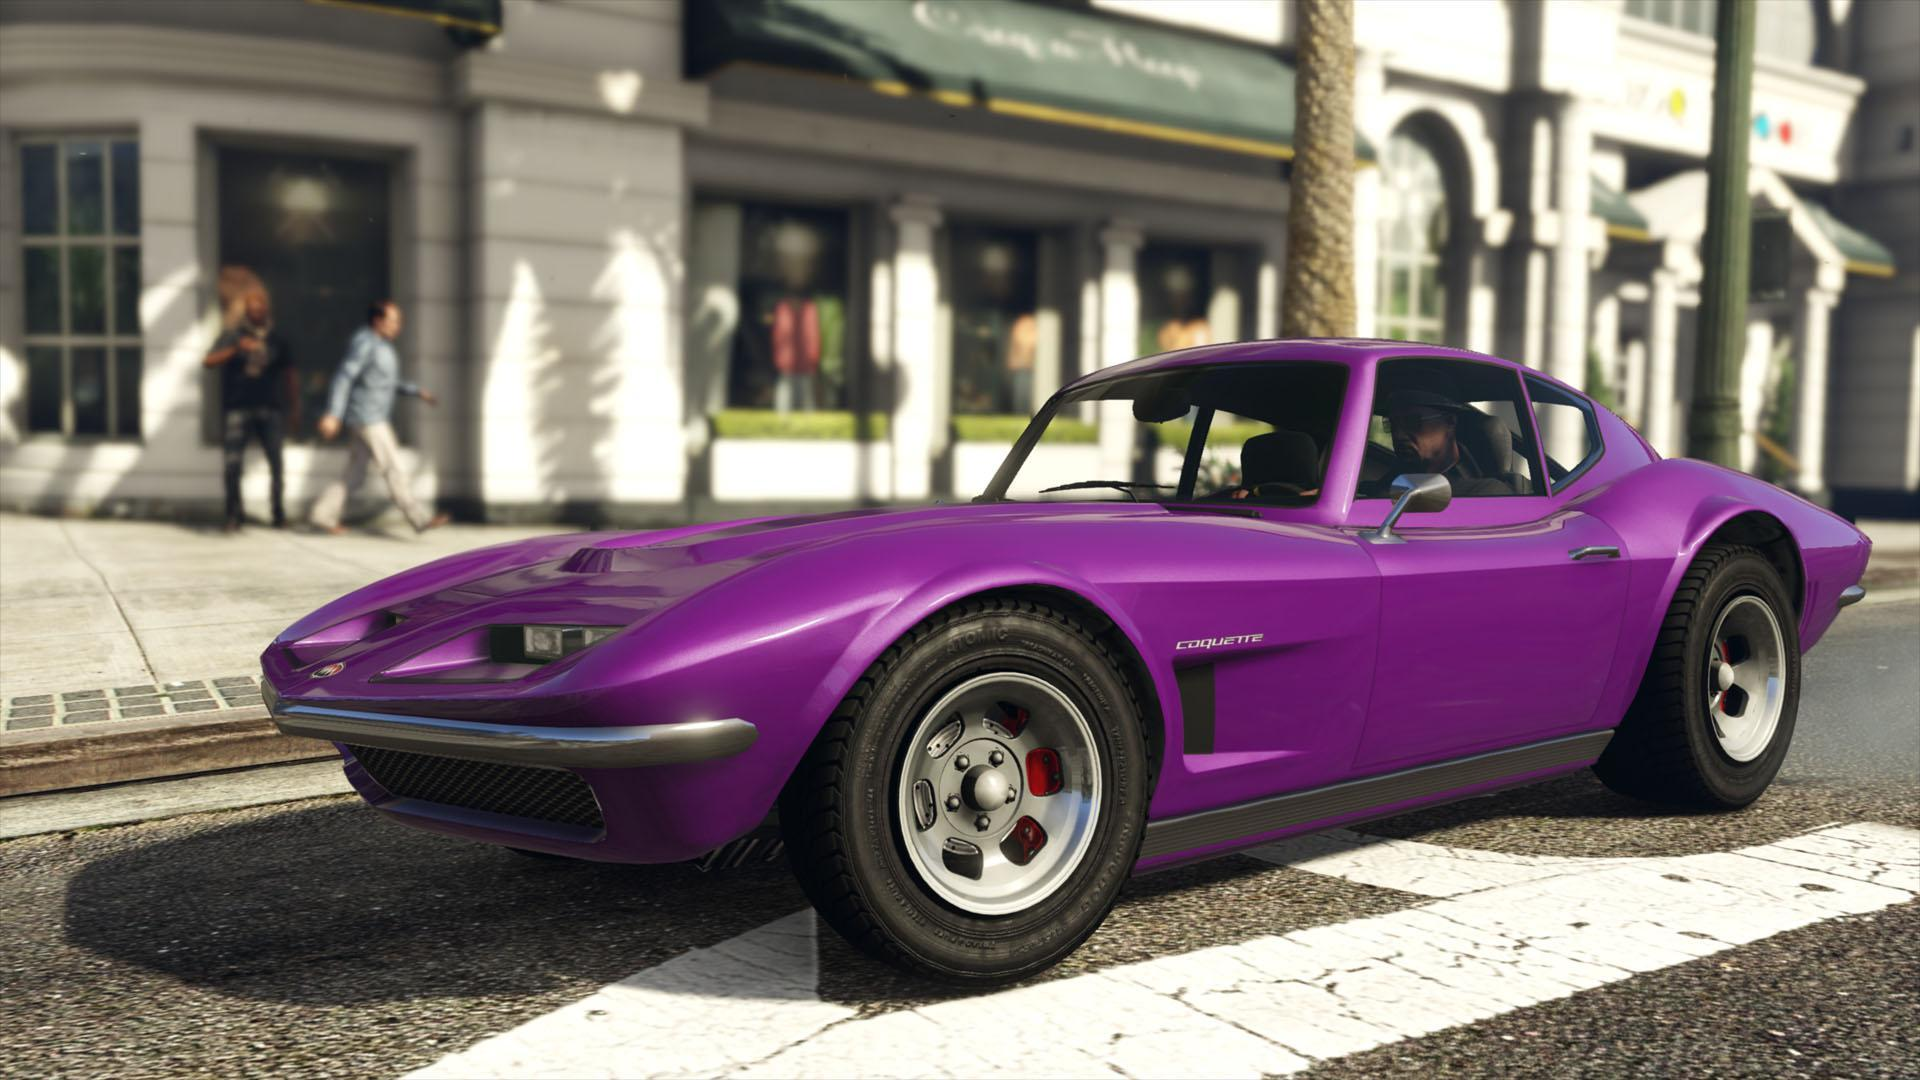 Coquette Classic - GTA V Vehicles Database & Statistics